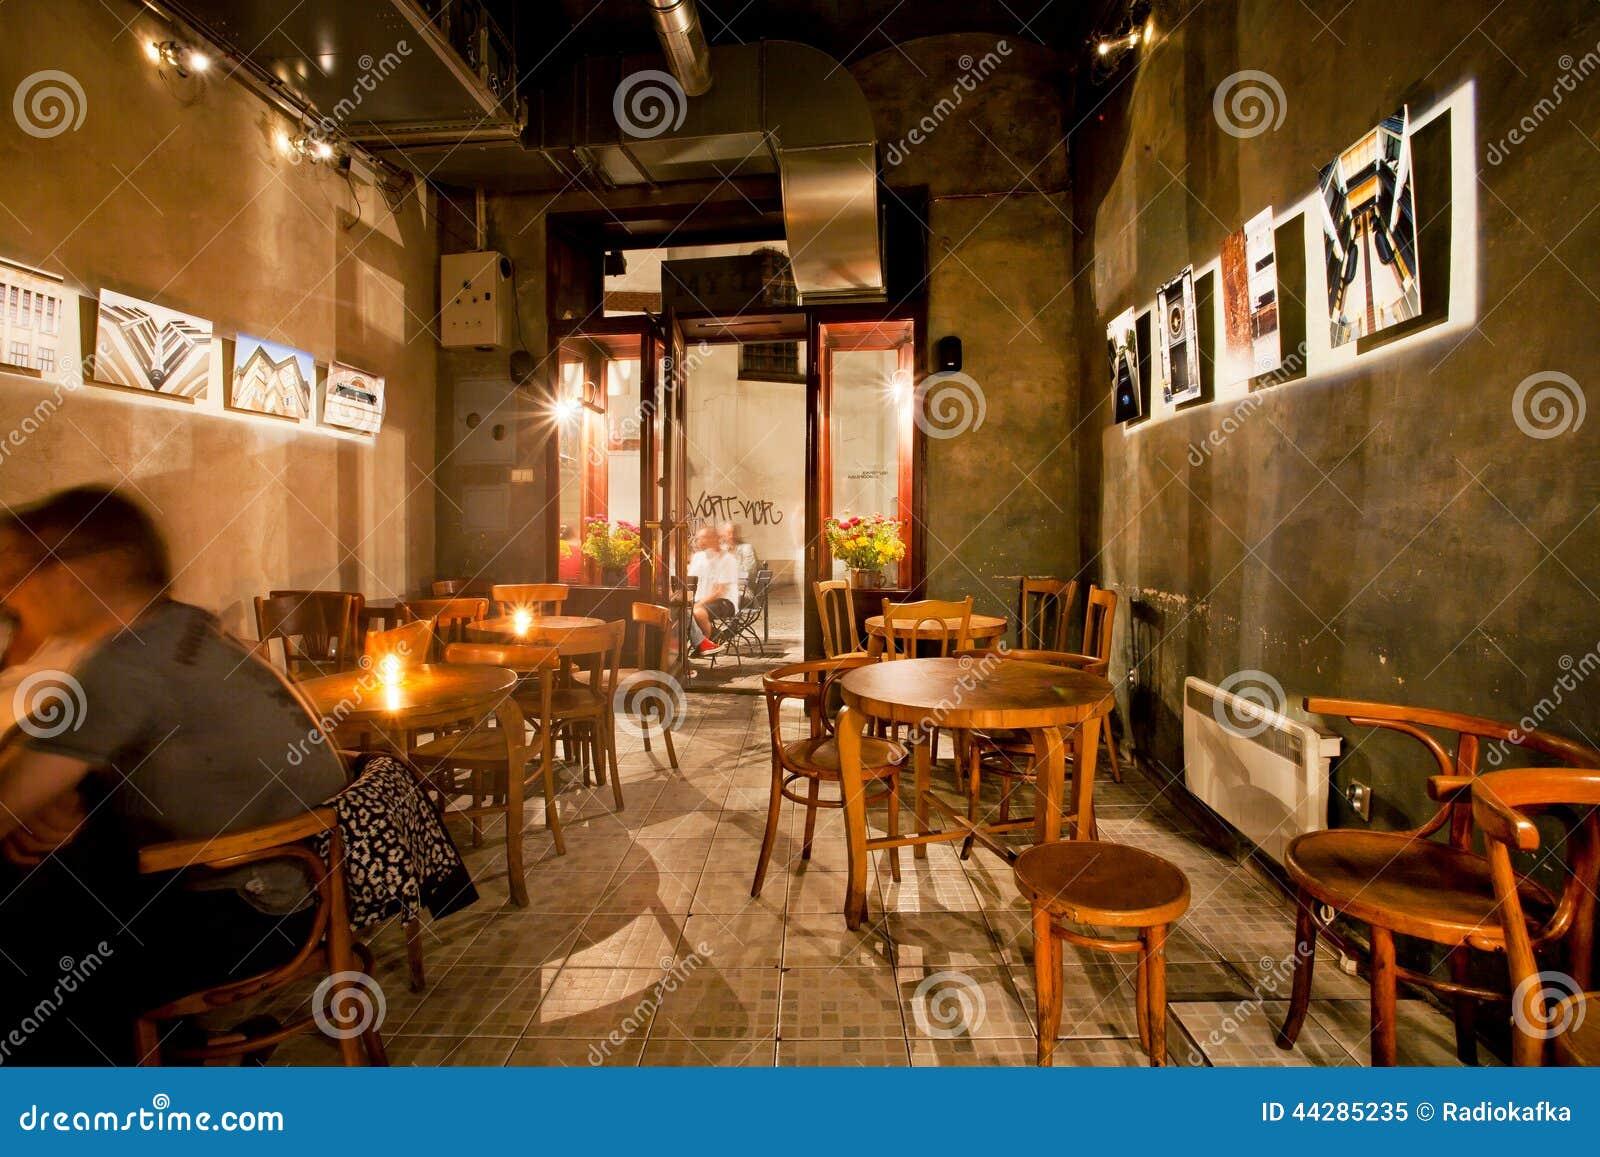 Old Bar And Restaurant Furniture